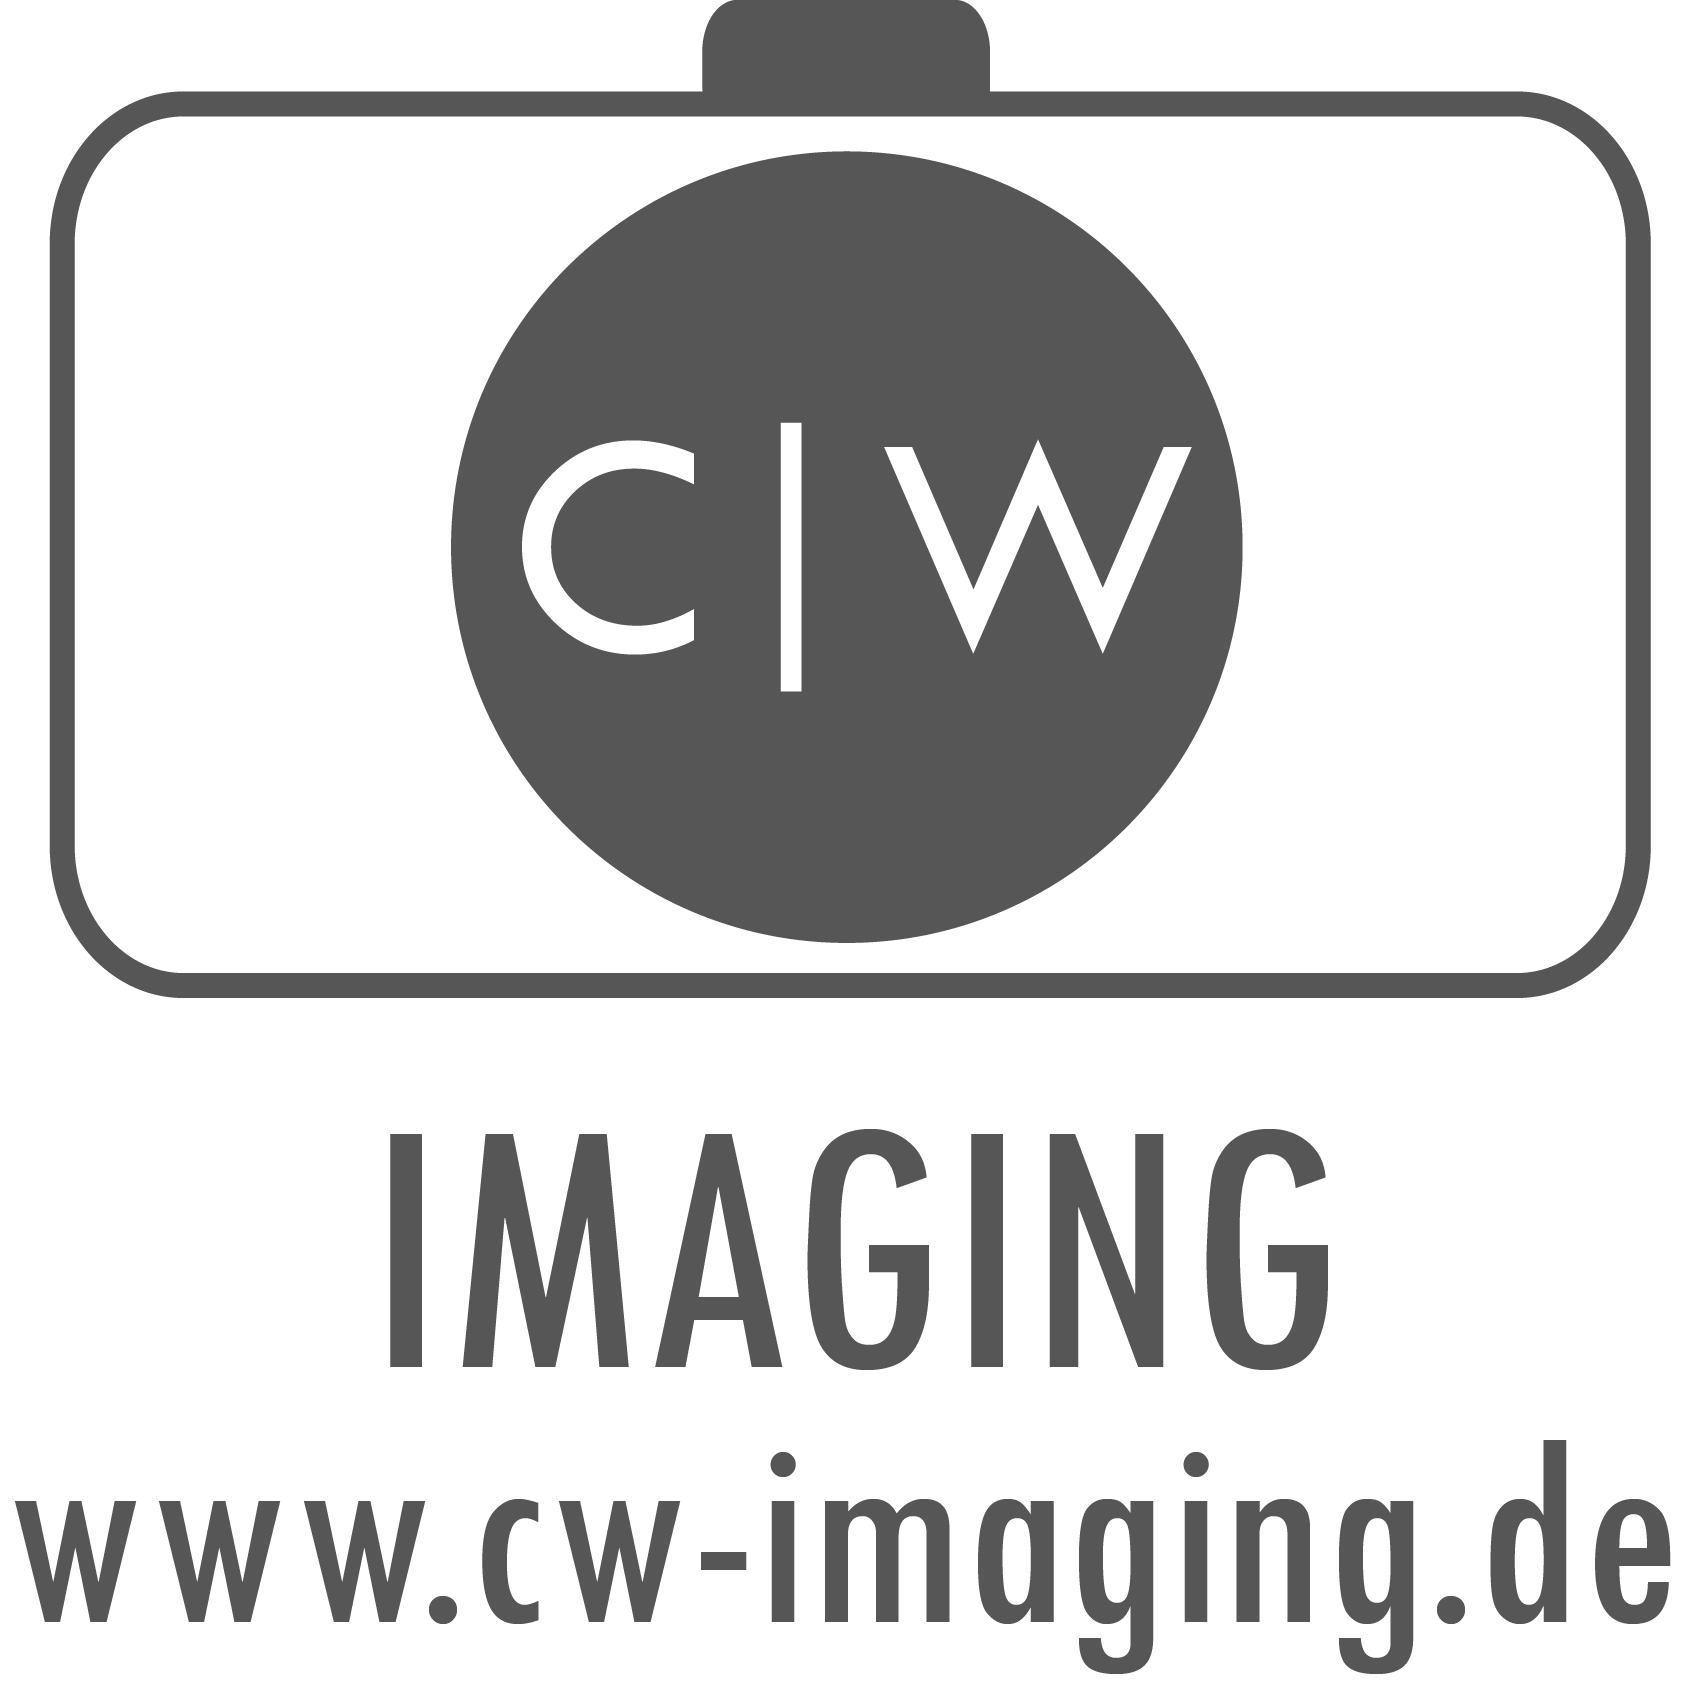 cwimaging-logo